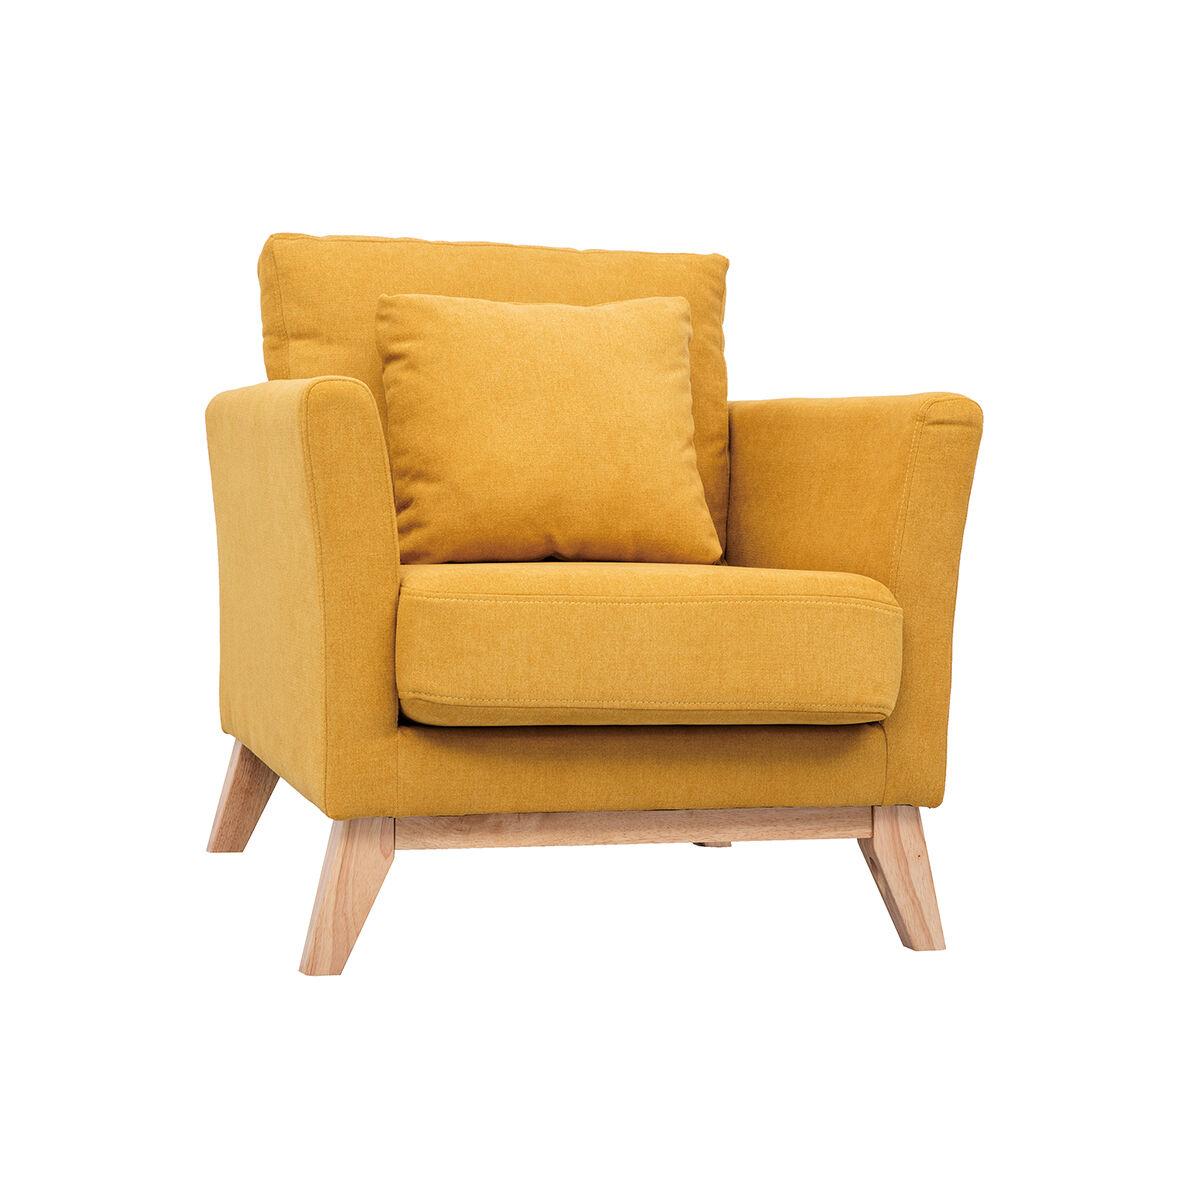 Miliboo Fauteuil scandinave déhoussable tissu effet velours jaune moutarde OSLO